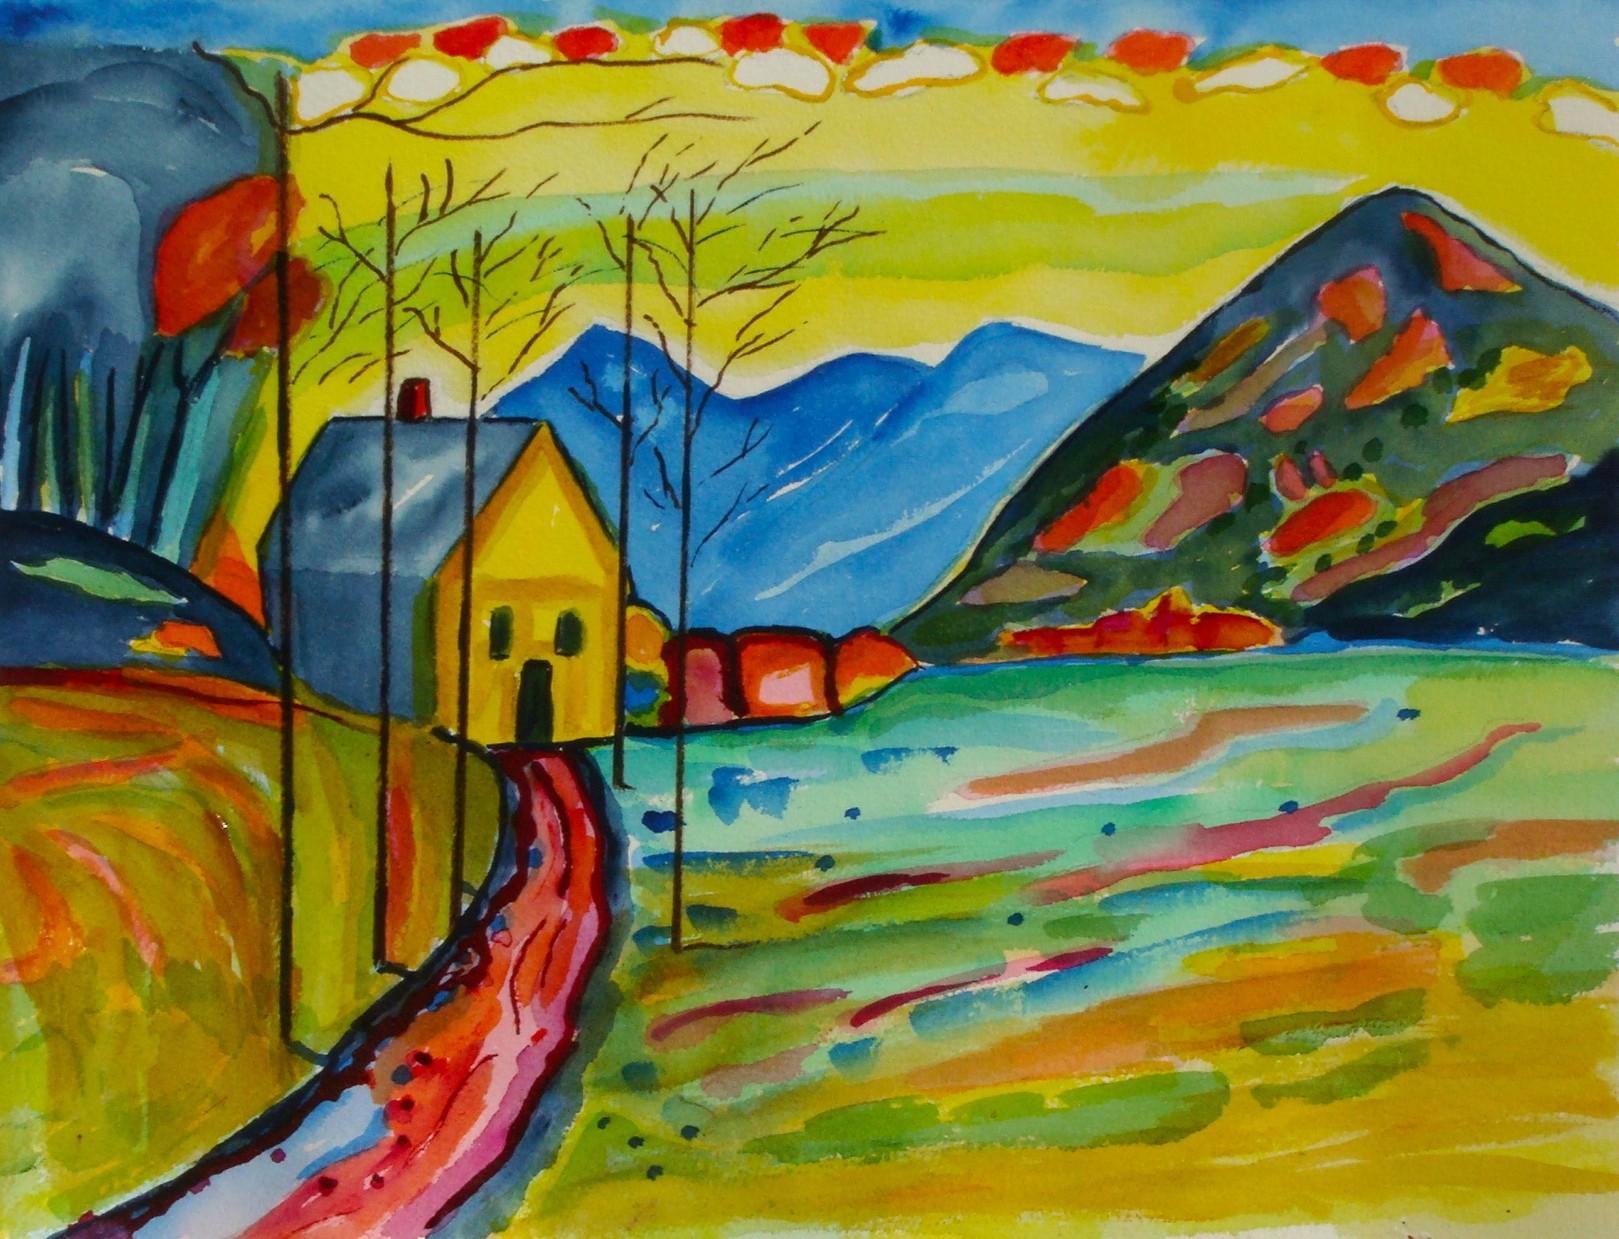 Murnau, watercolor, 13.5 x 10.5, 2014, SOLD